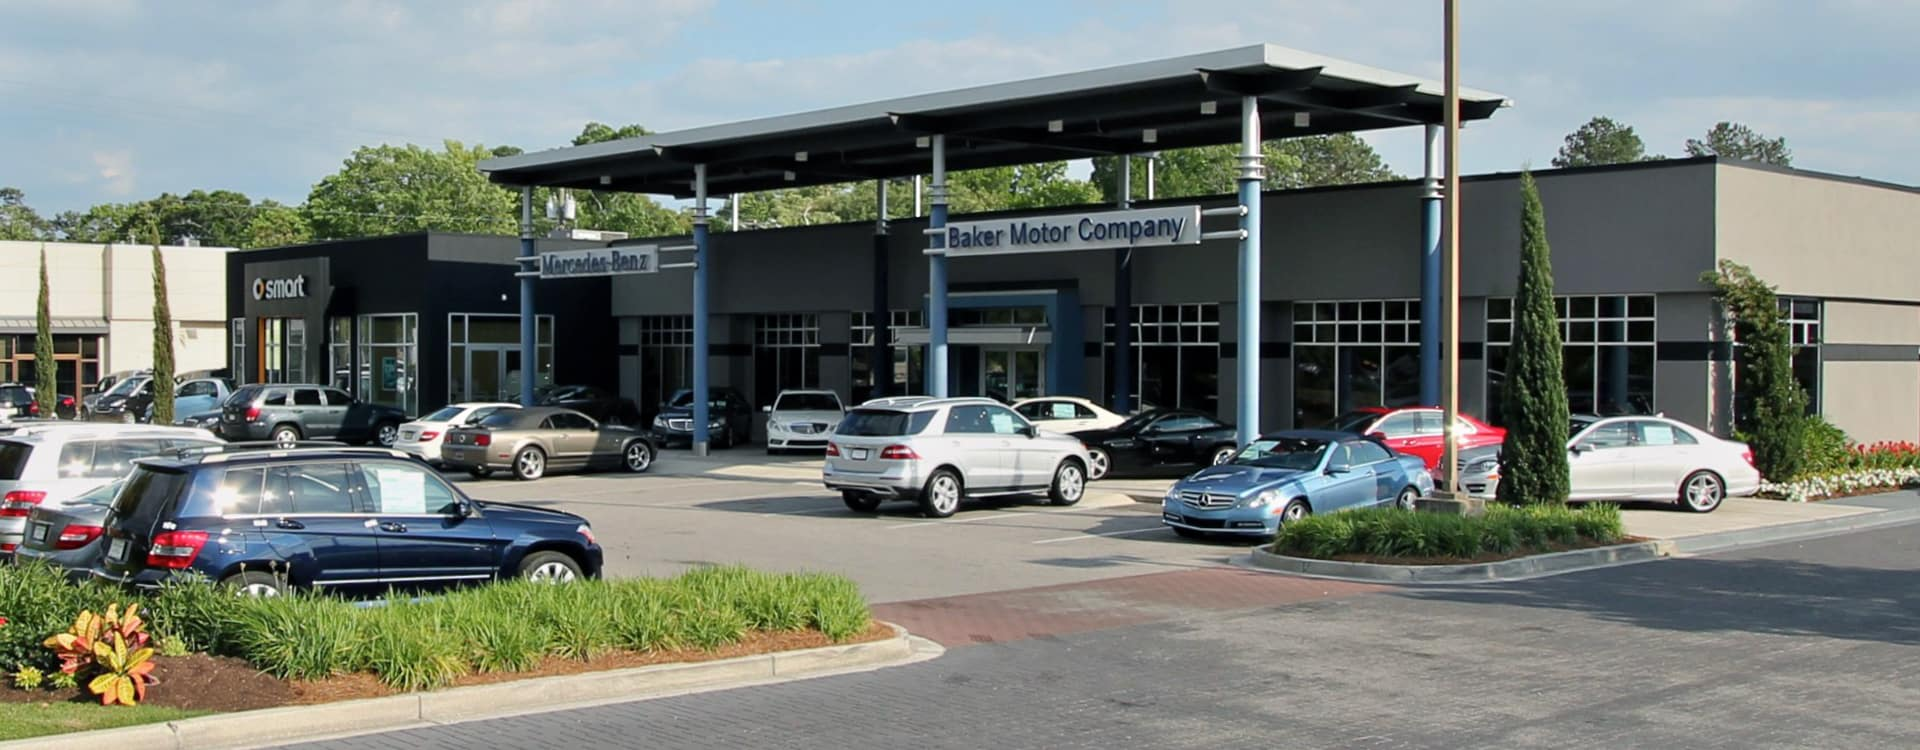 Baker Motor Company of Charleston